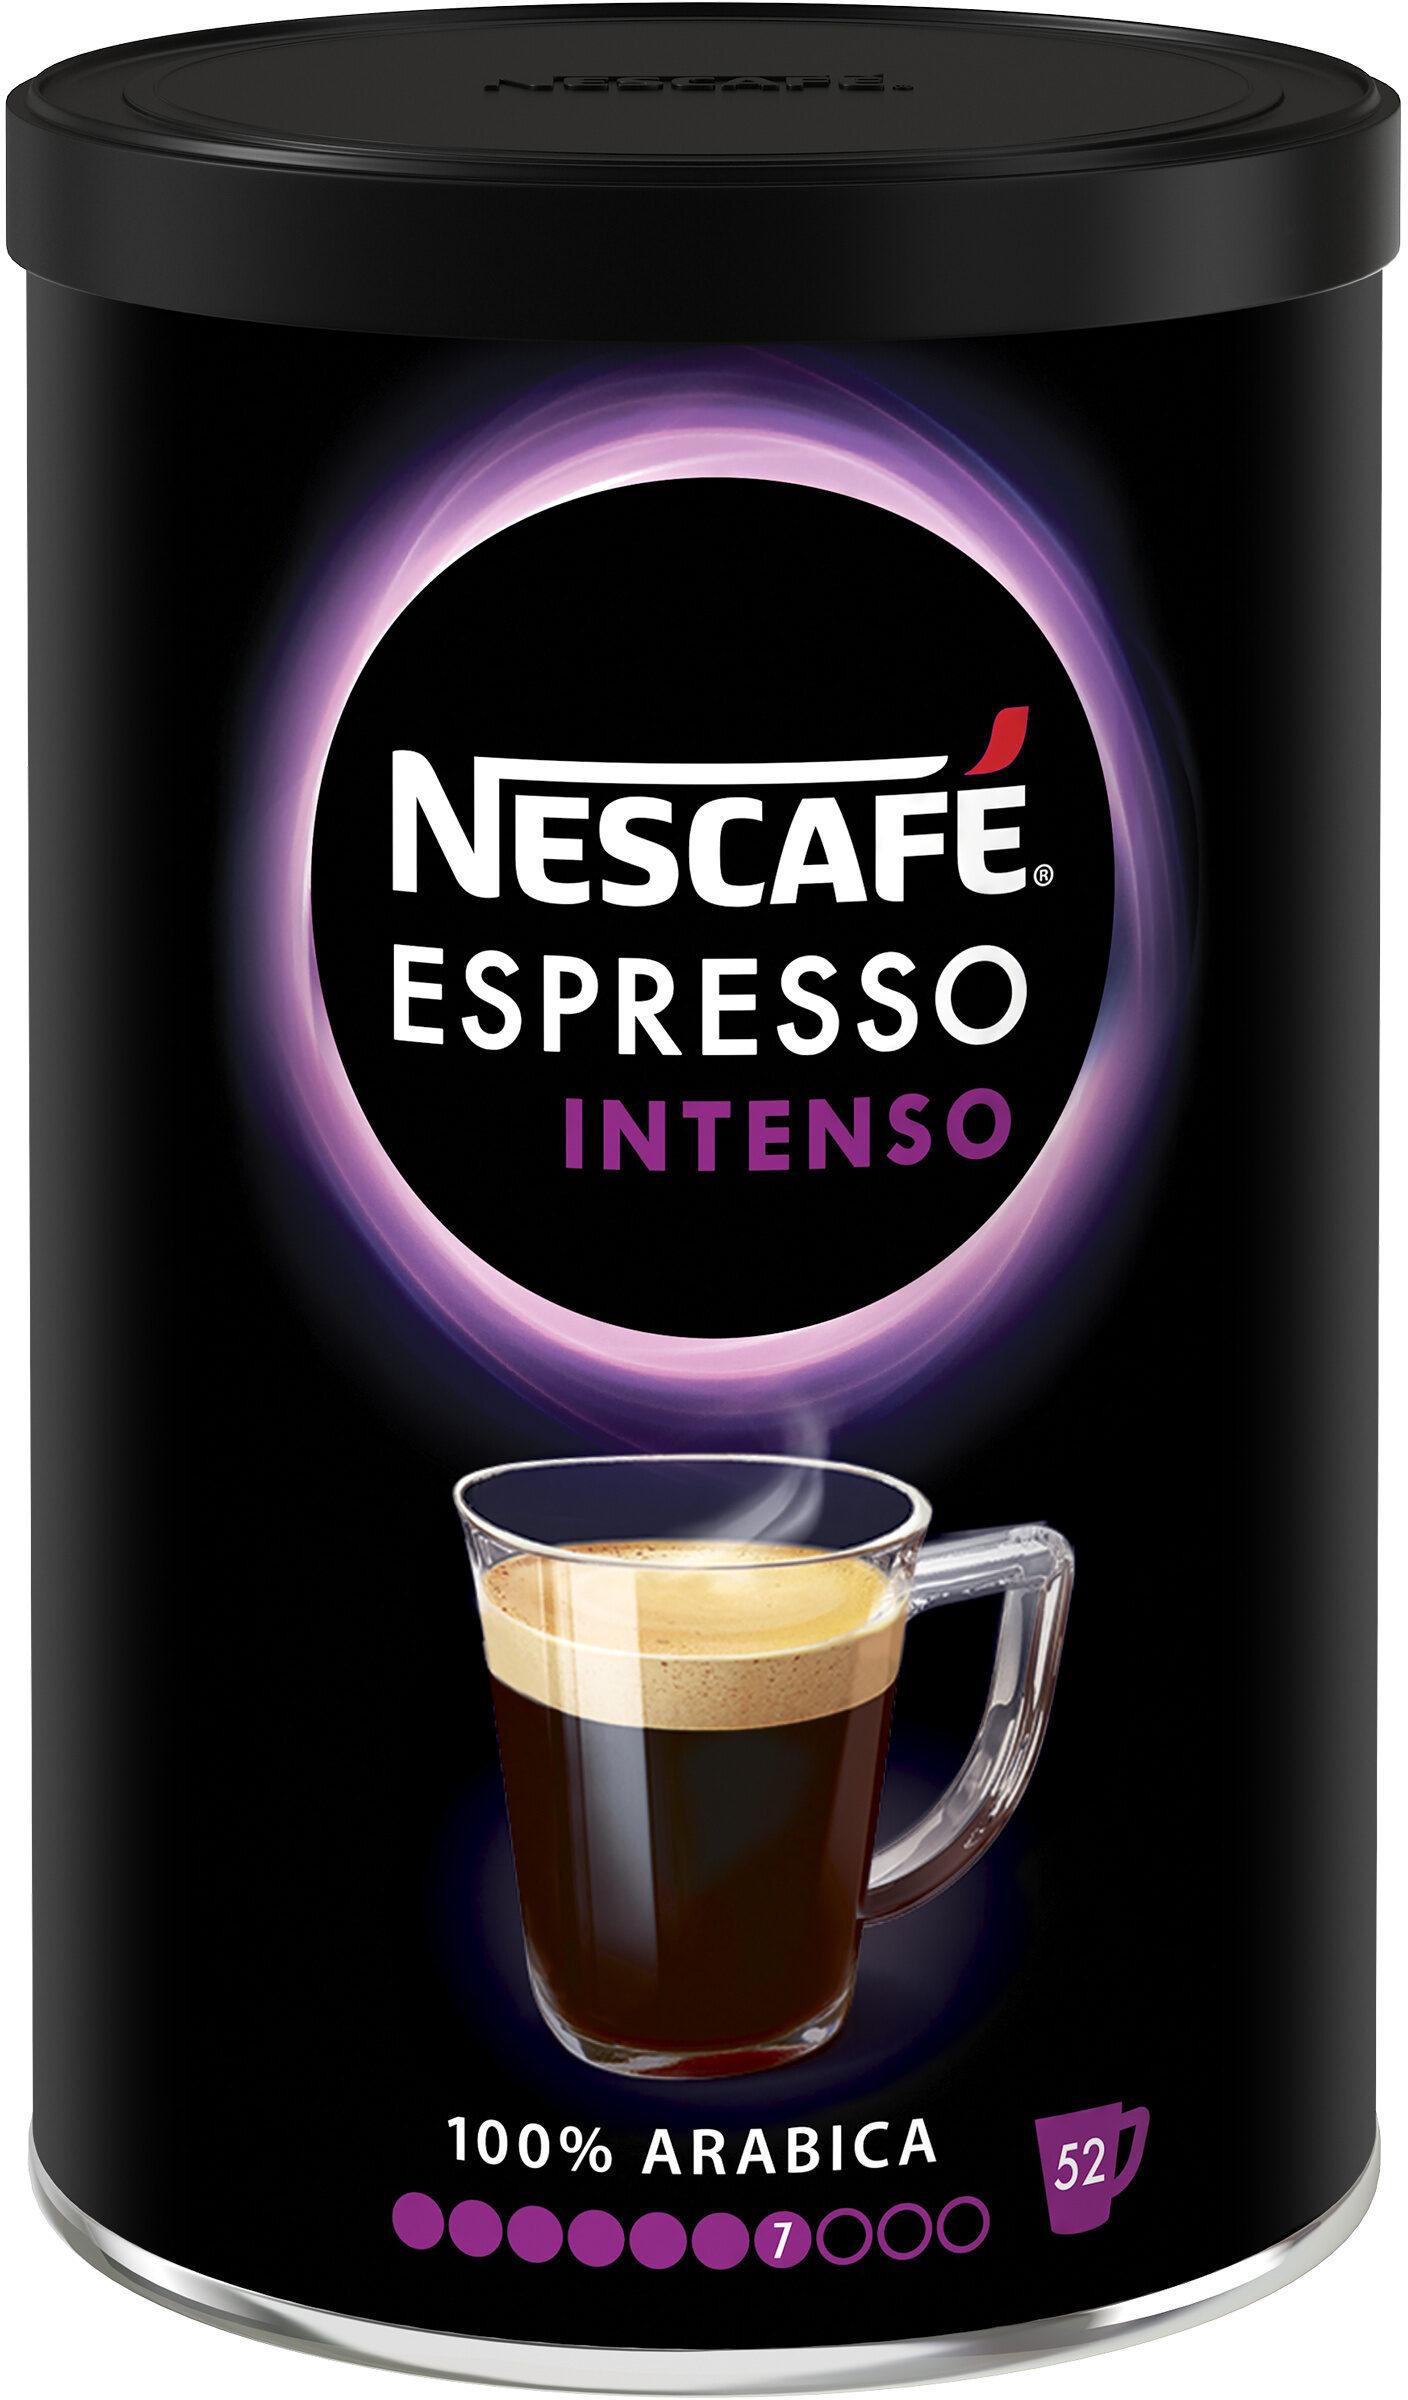 Espresso Intenso - Product - fr